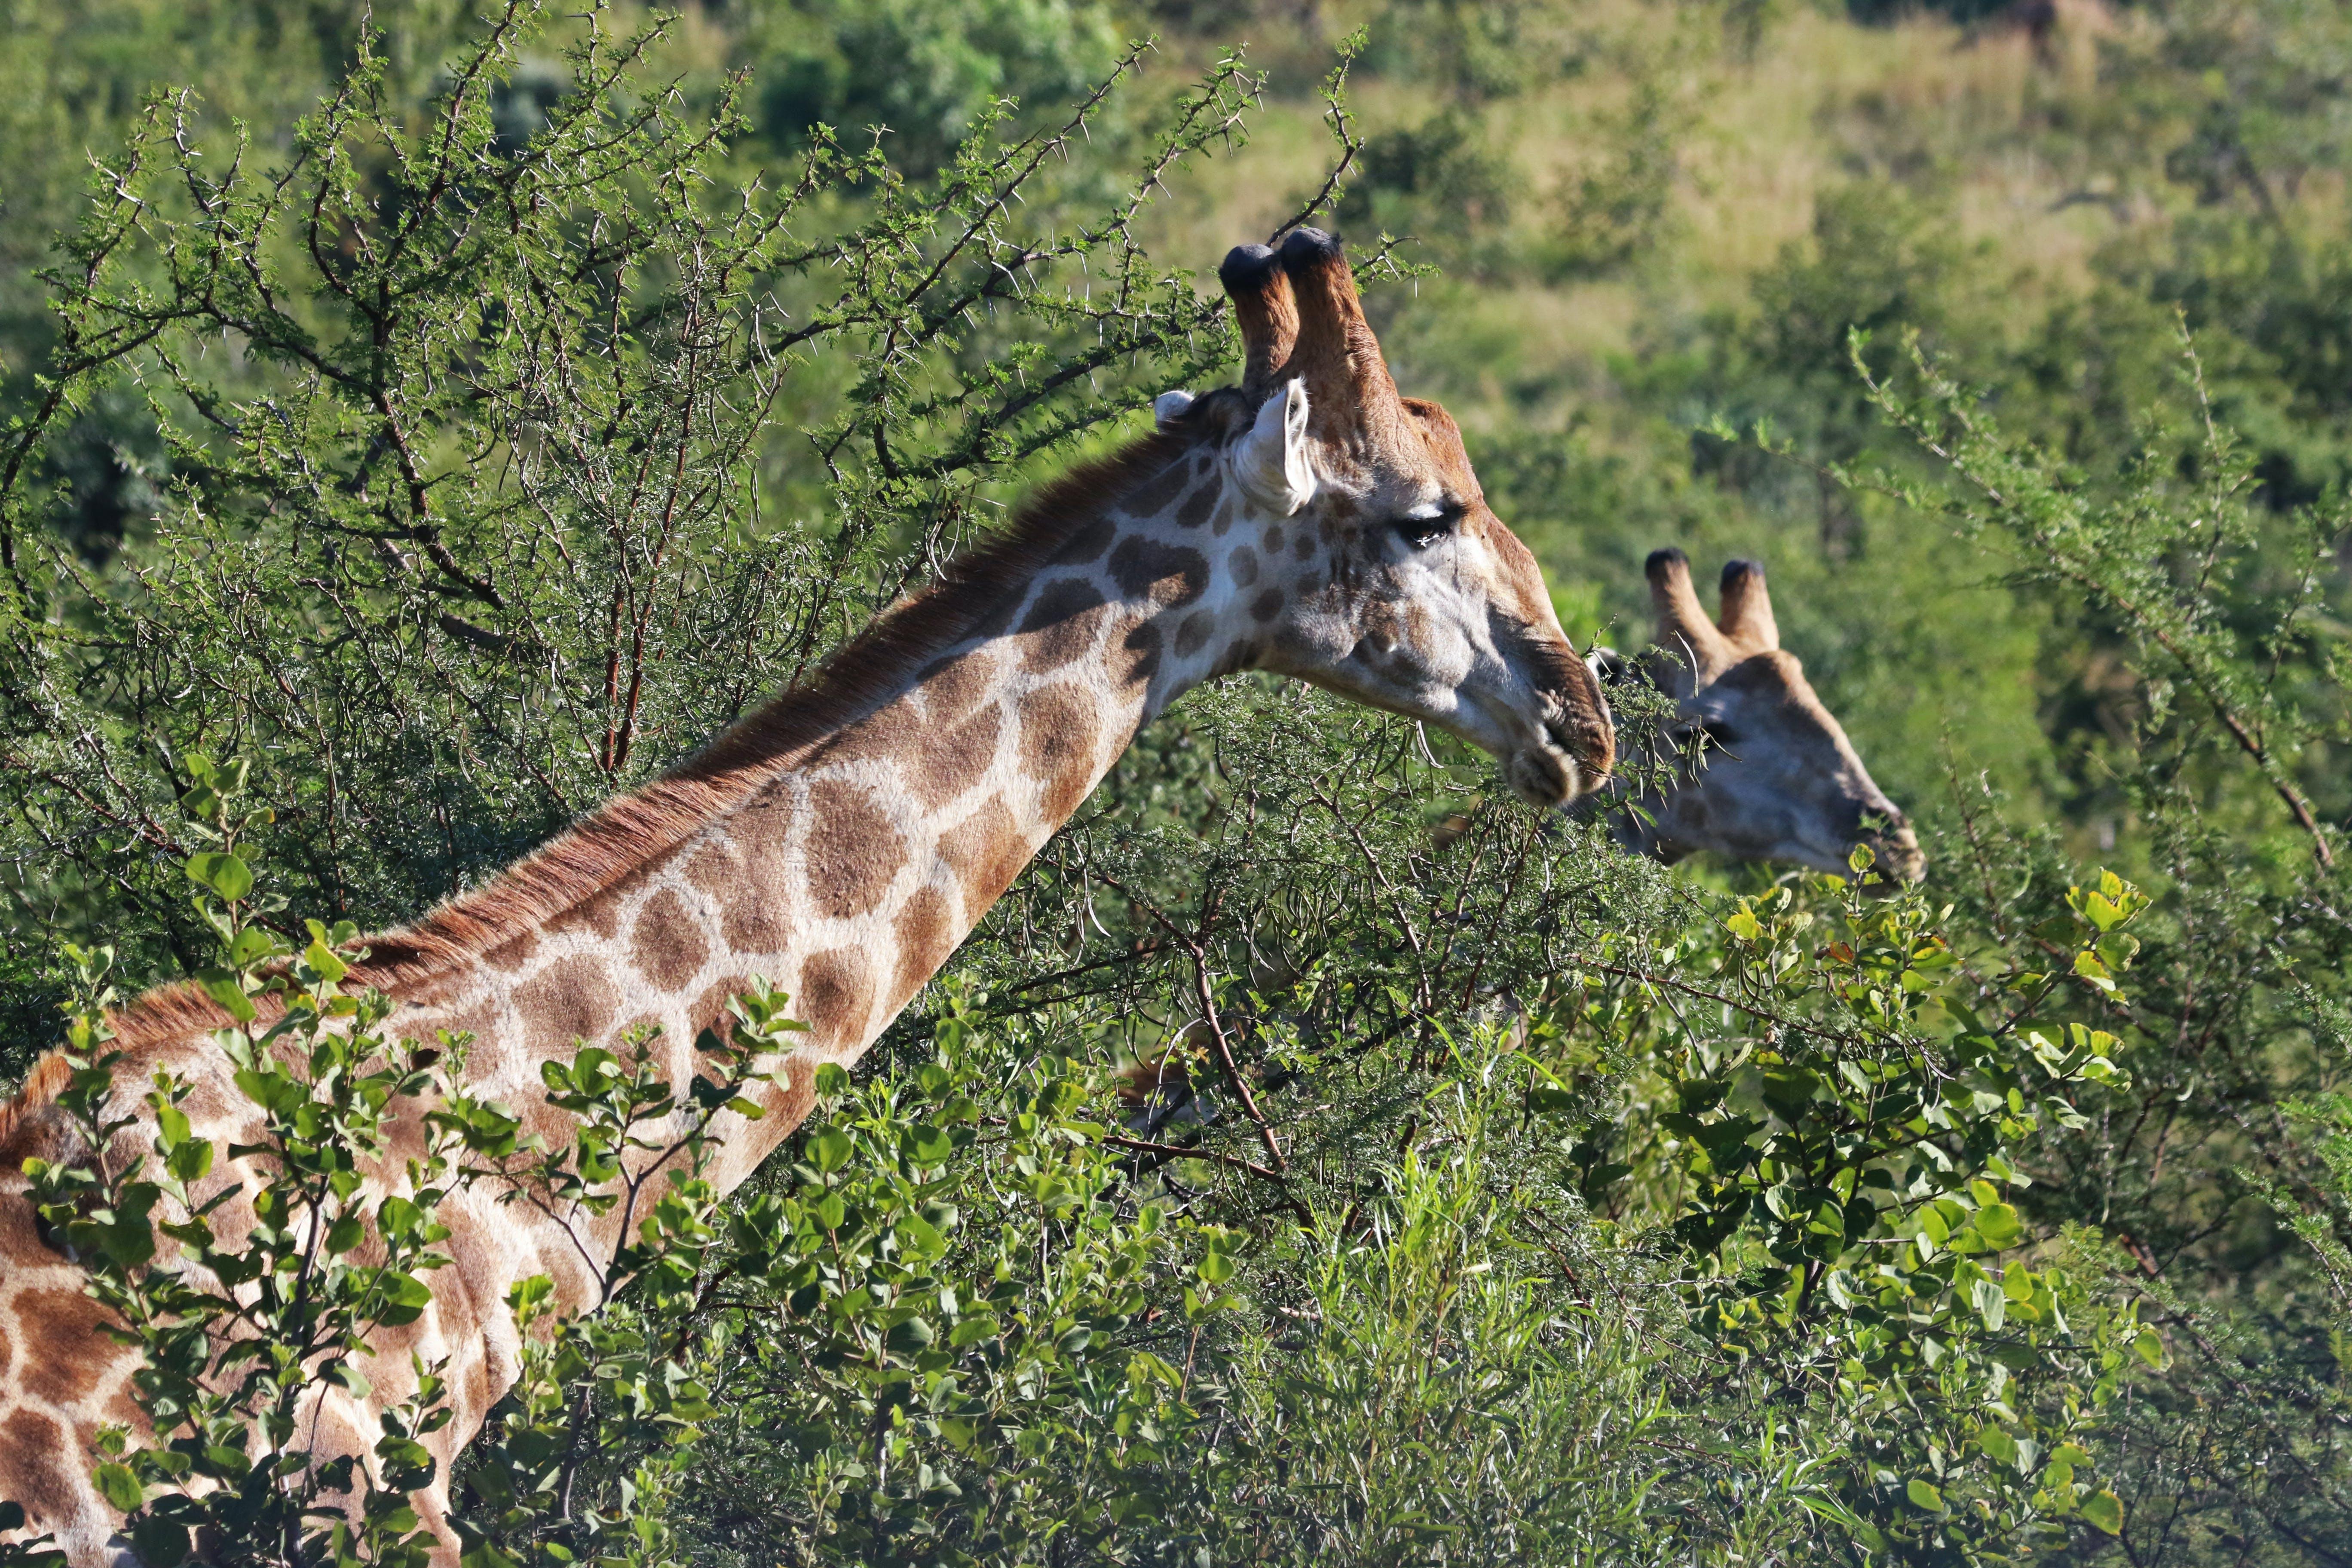 Close-Up Photography of Giraffe Near Trees